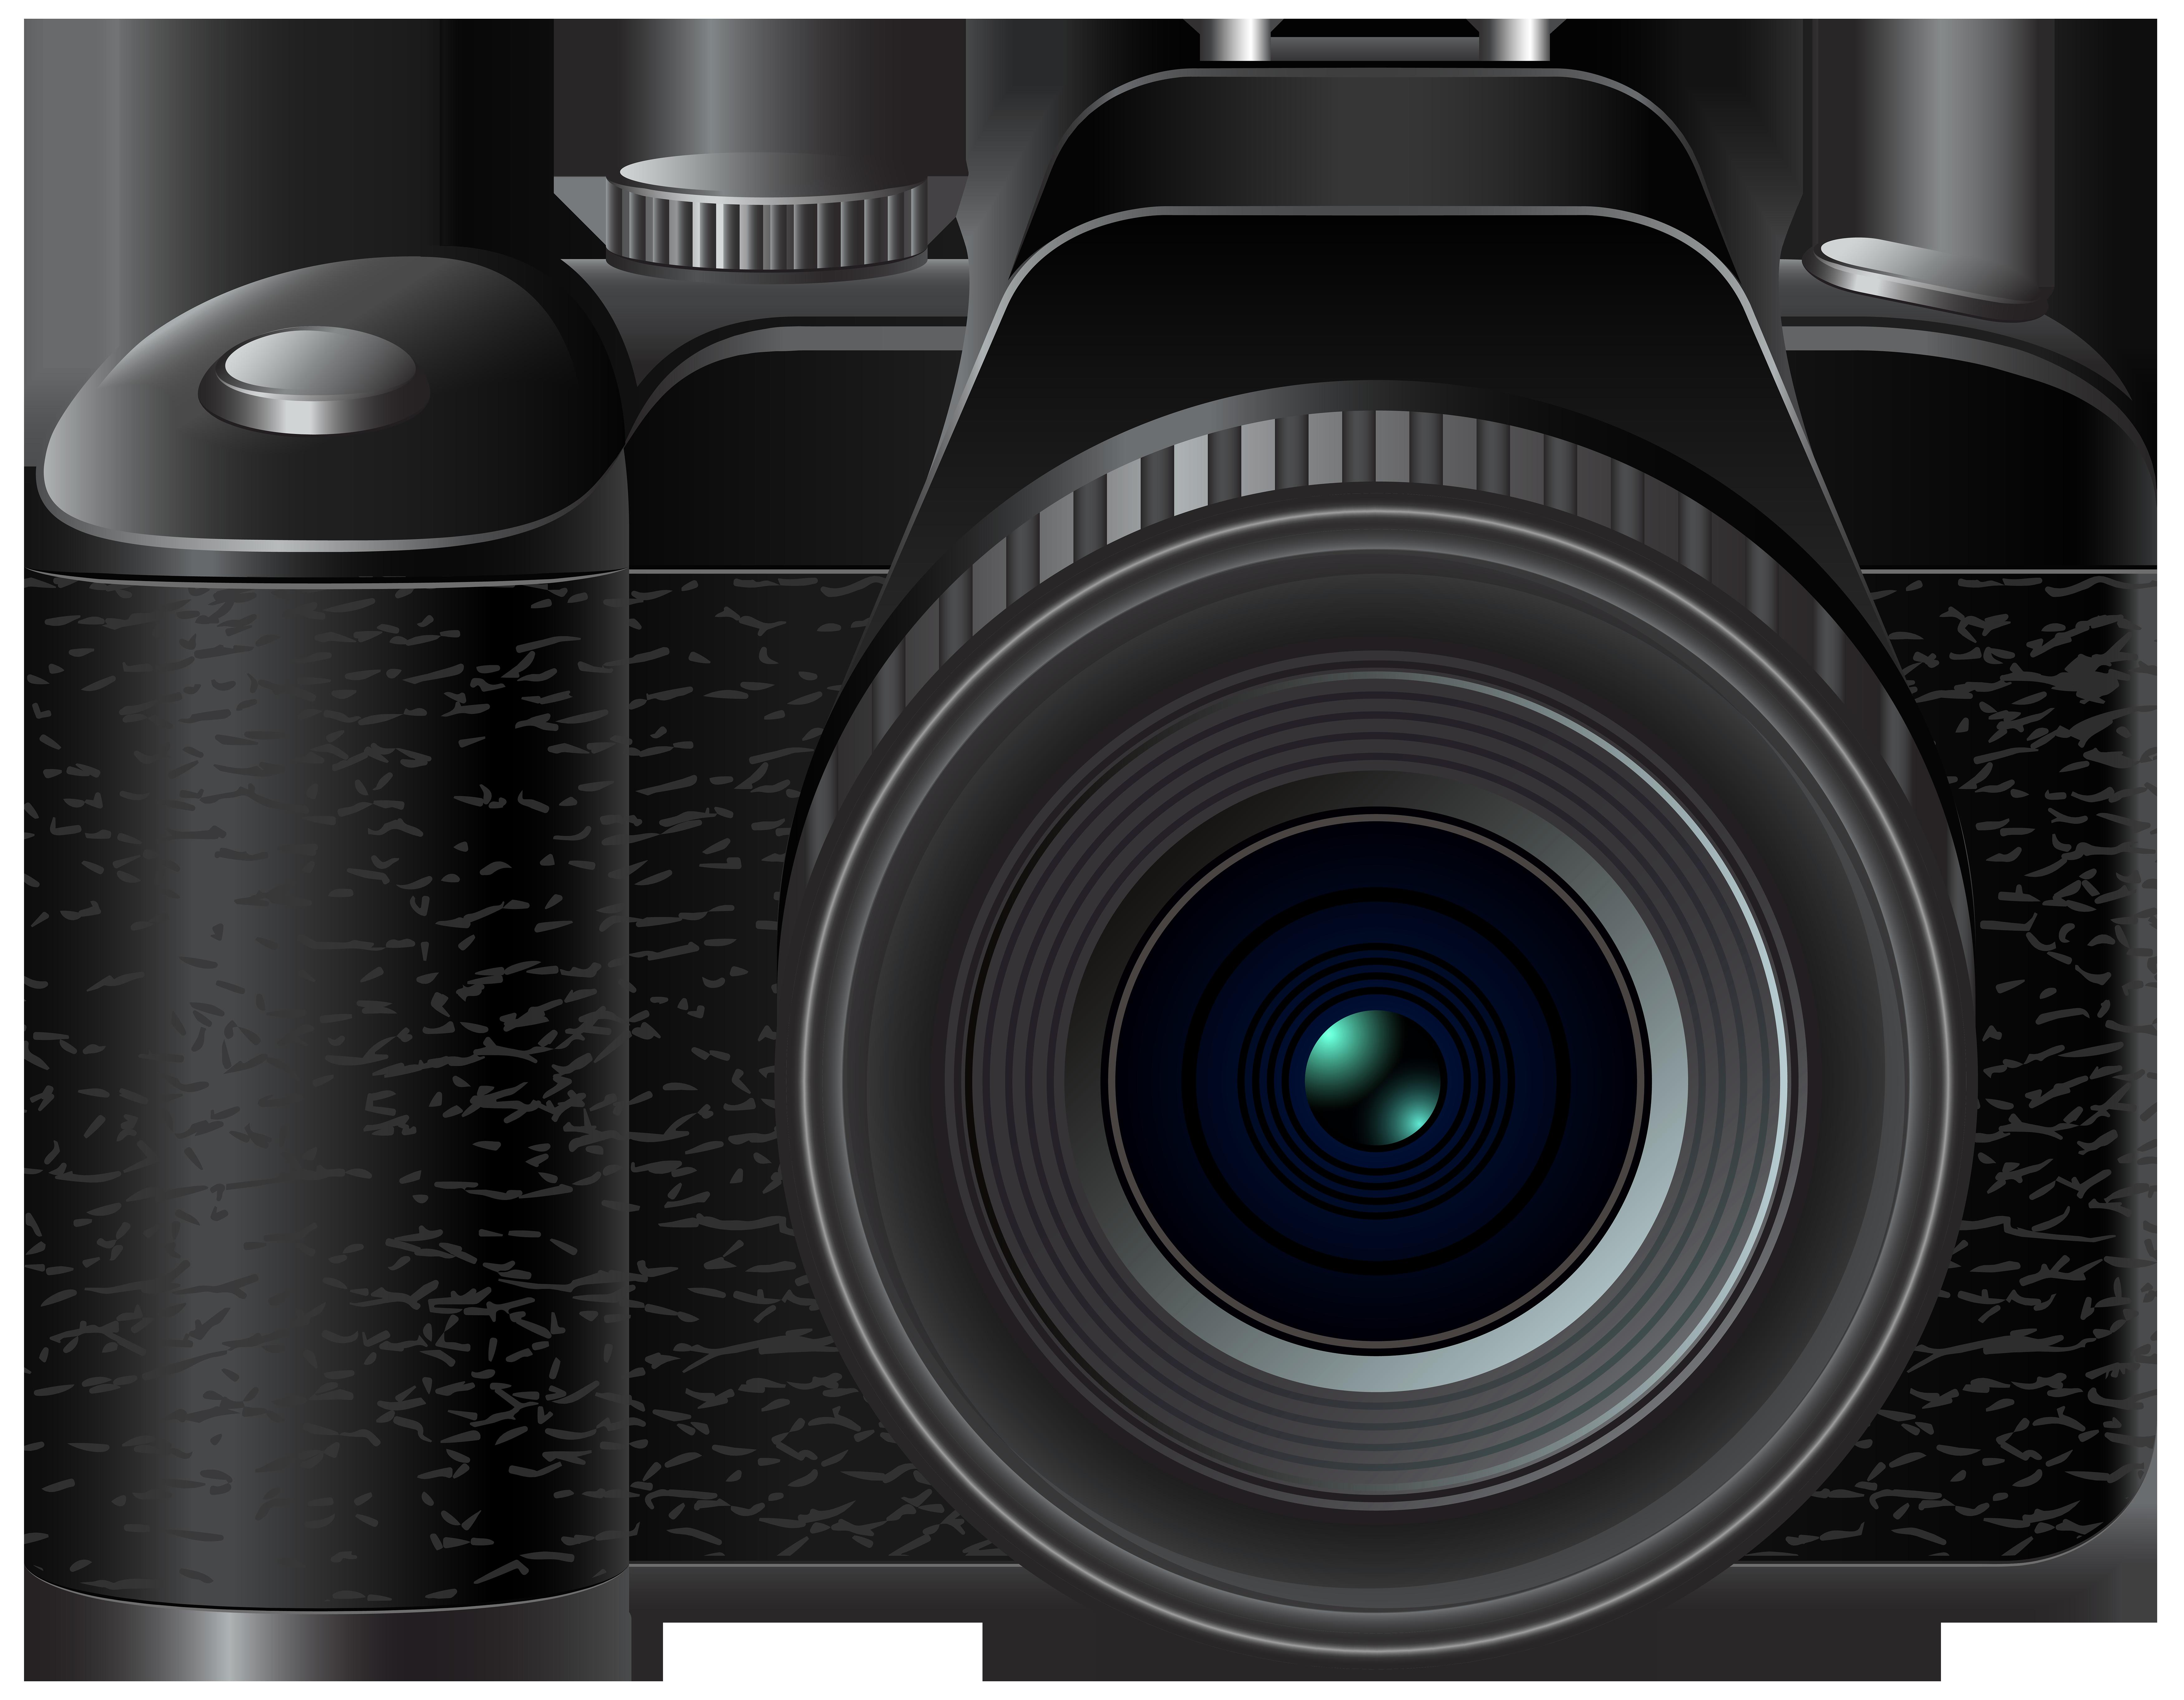 Yearbook clipart digital camera. Transparent png clip art